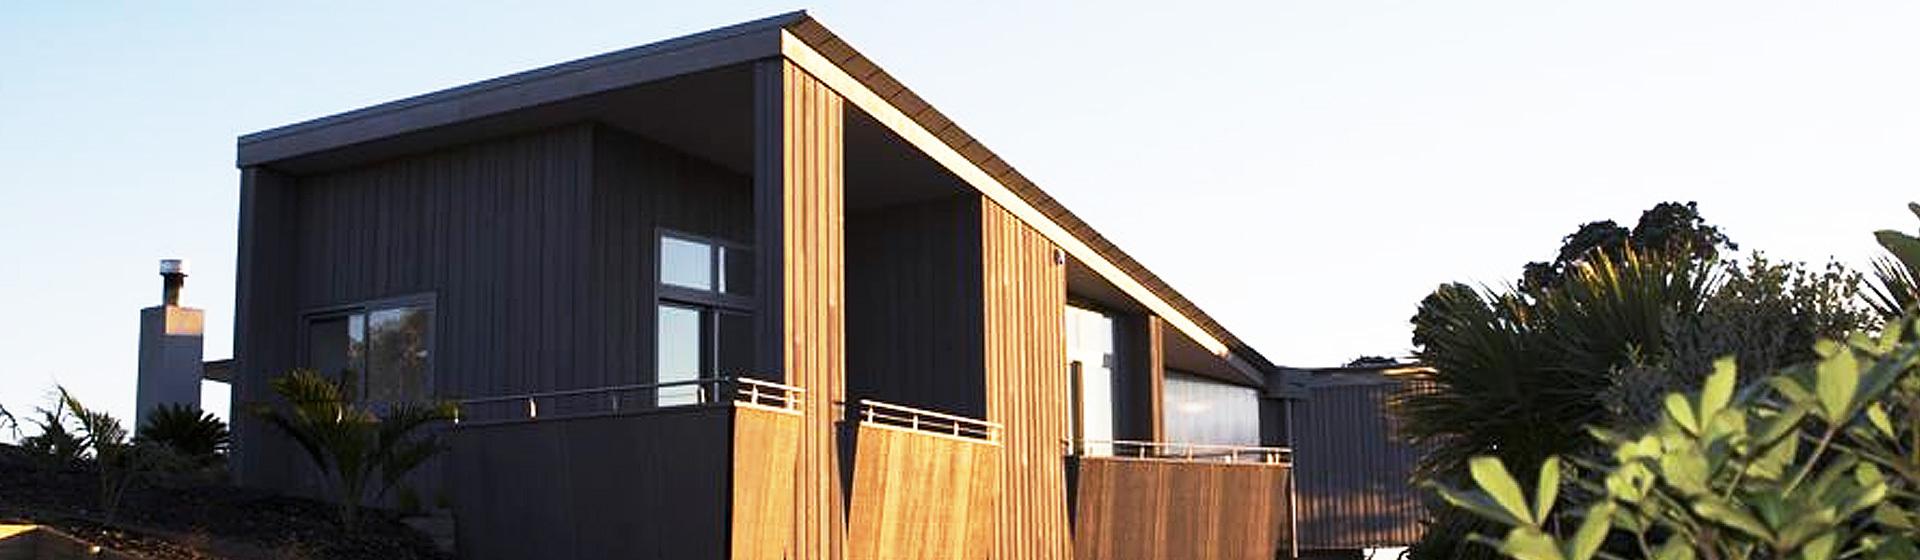 k2 builders ltd waiheke island. Black Bedroom Furniture Sets. Home Design Ideas